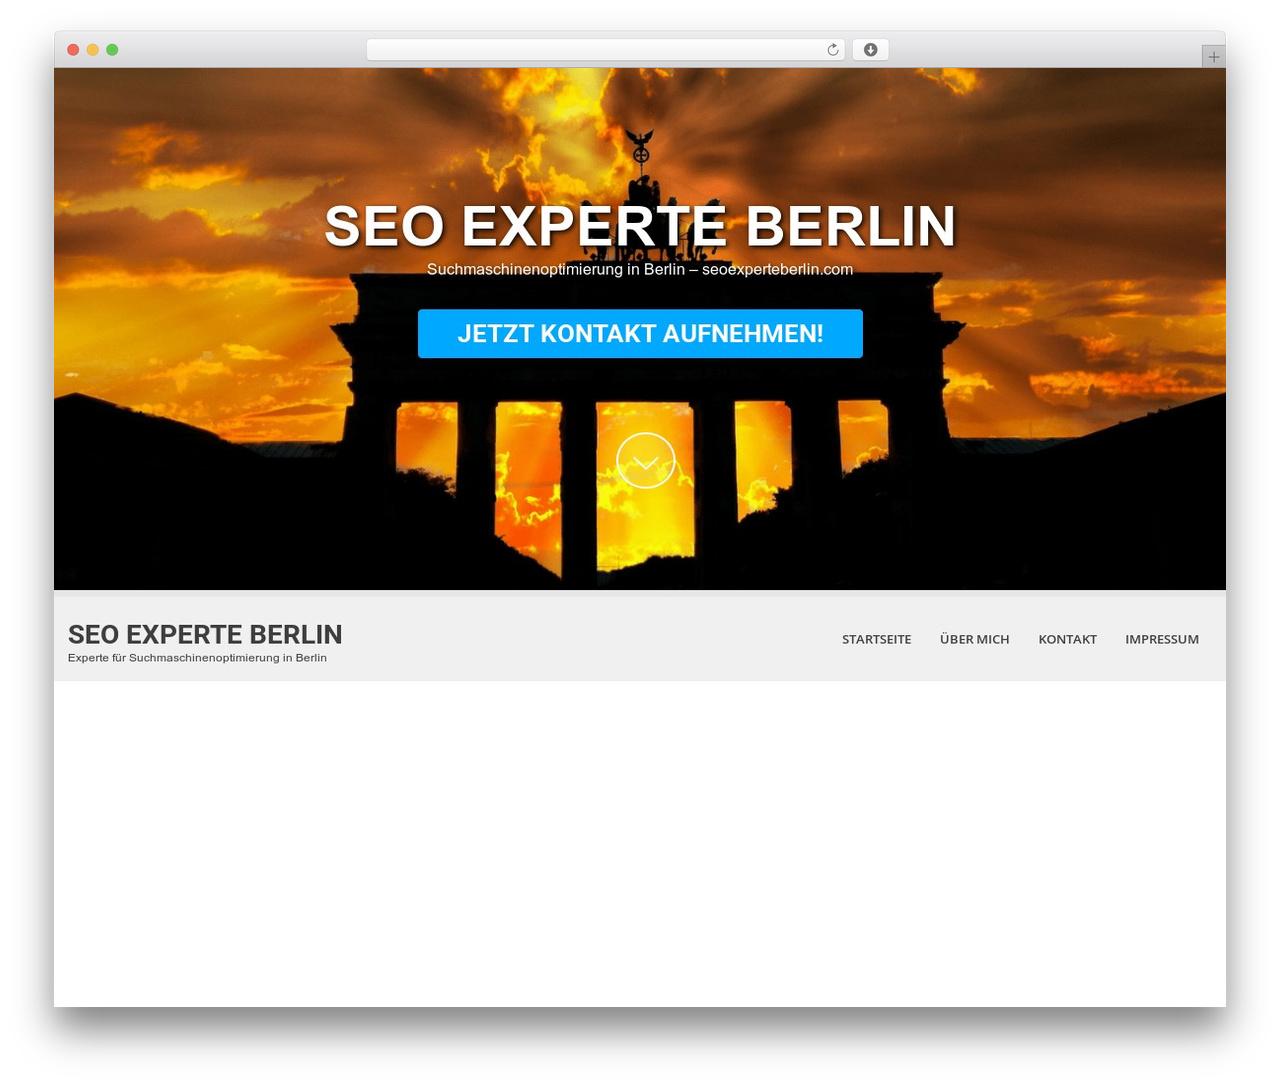 WordPress website template SKT White - seoexperteberlin.com